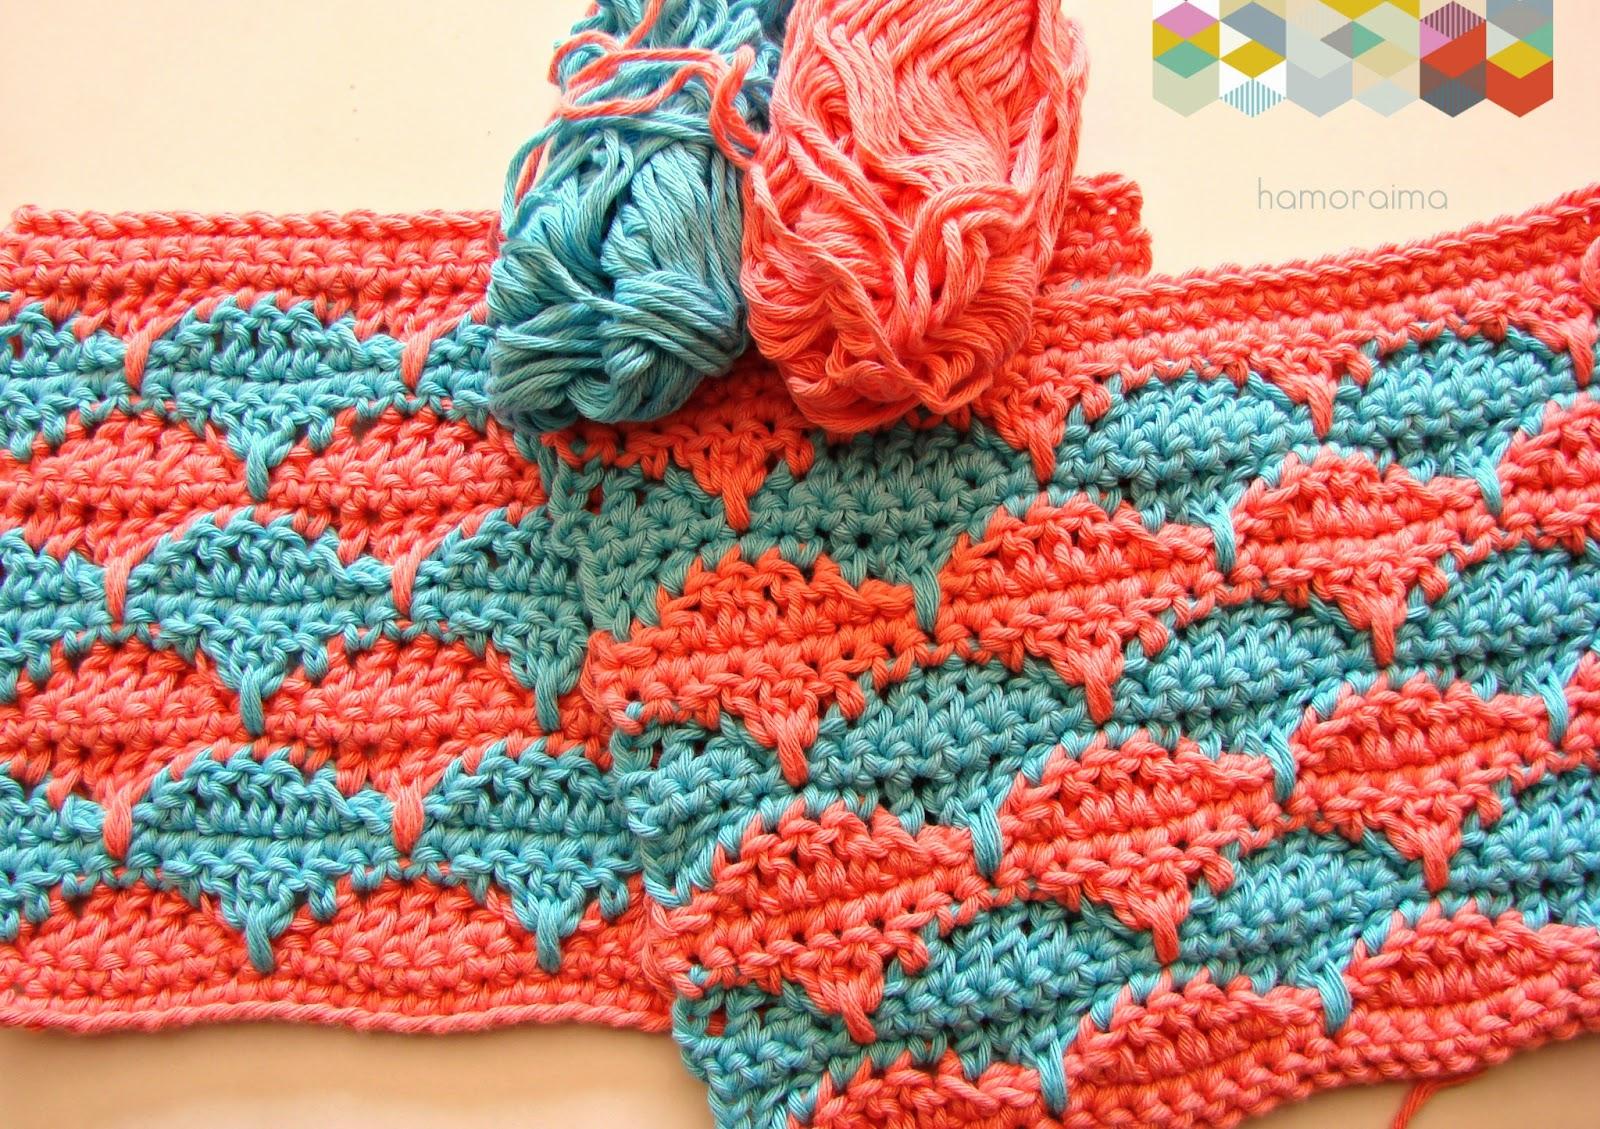 Abanicos de crochet - hamoraima